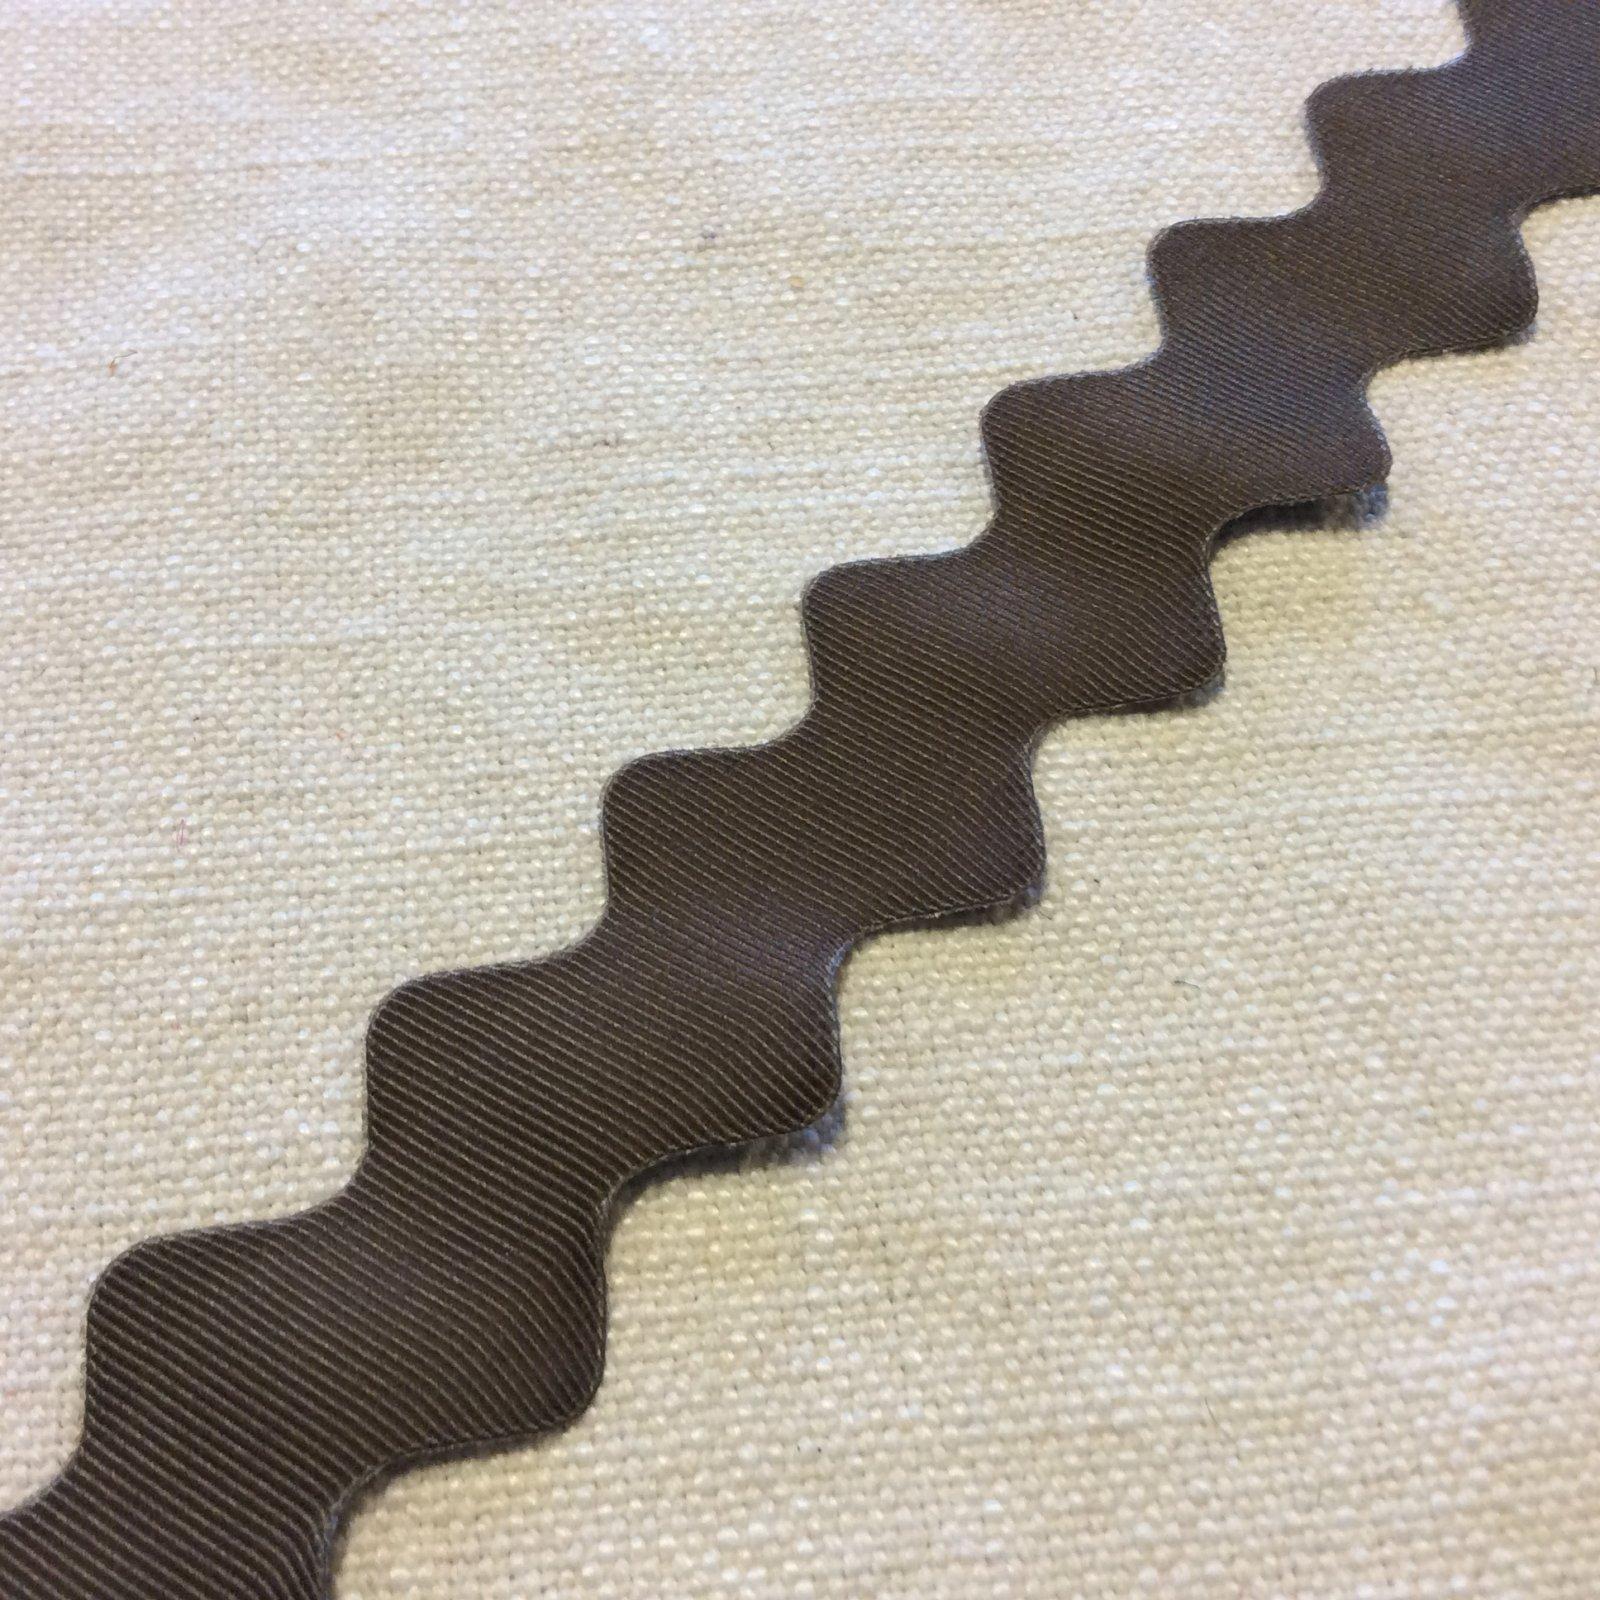 Chocolate Brown Grosgrain Wavy 1 Wide Ric Rac Ribbon Trim RIB1353